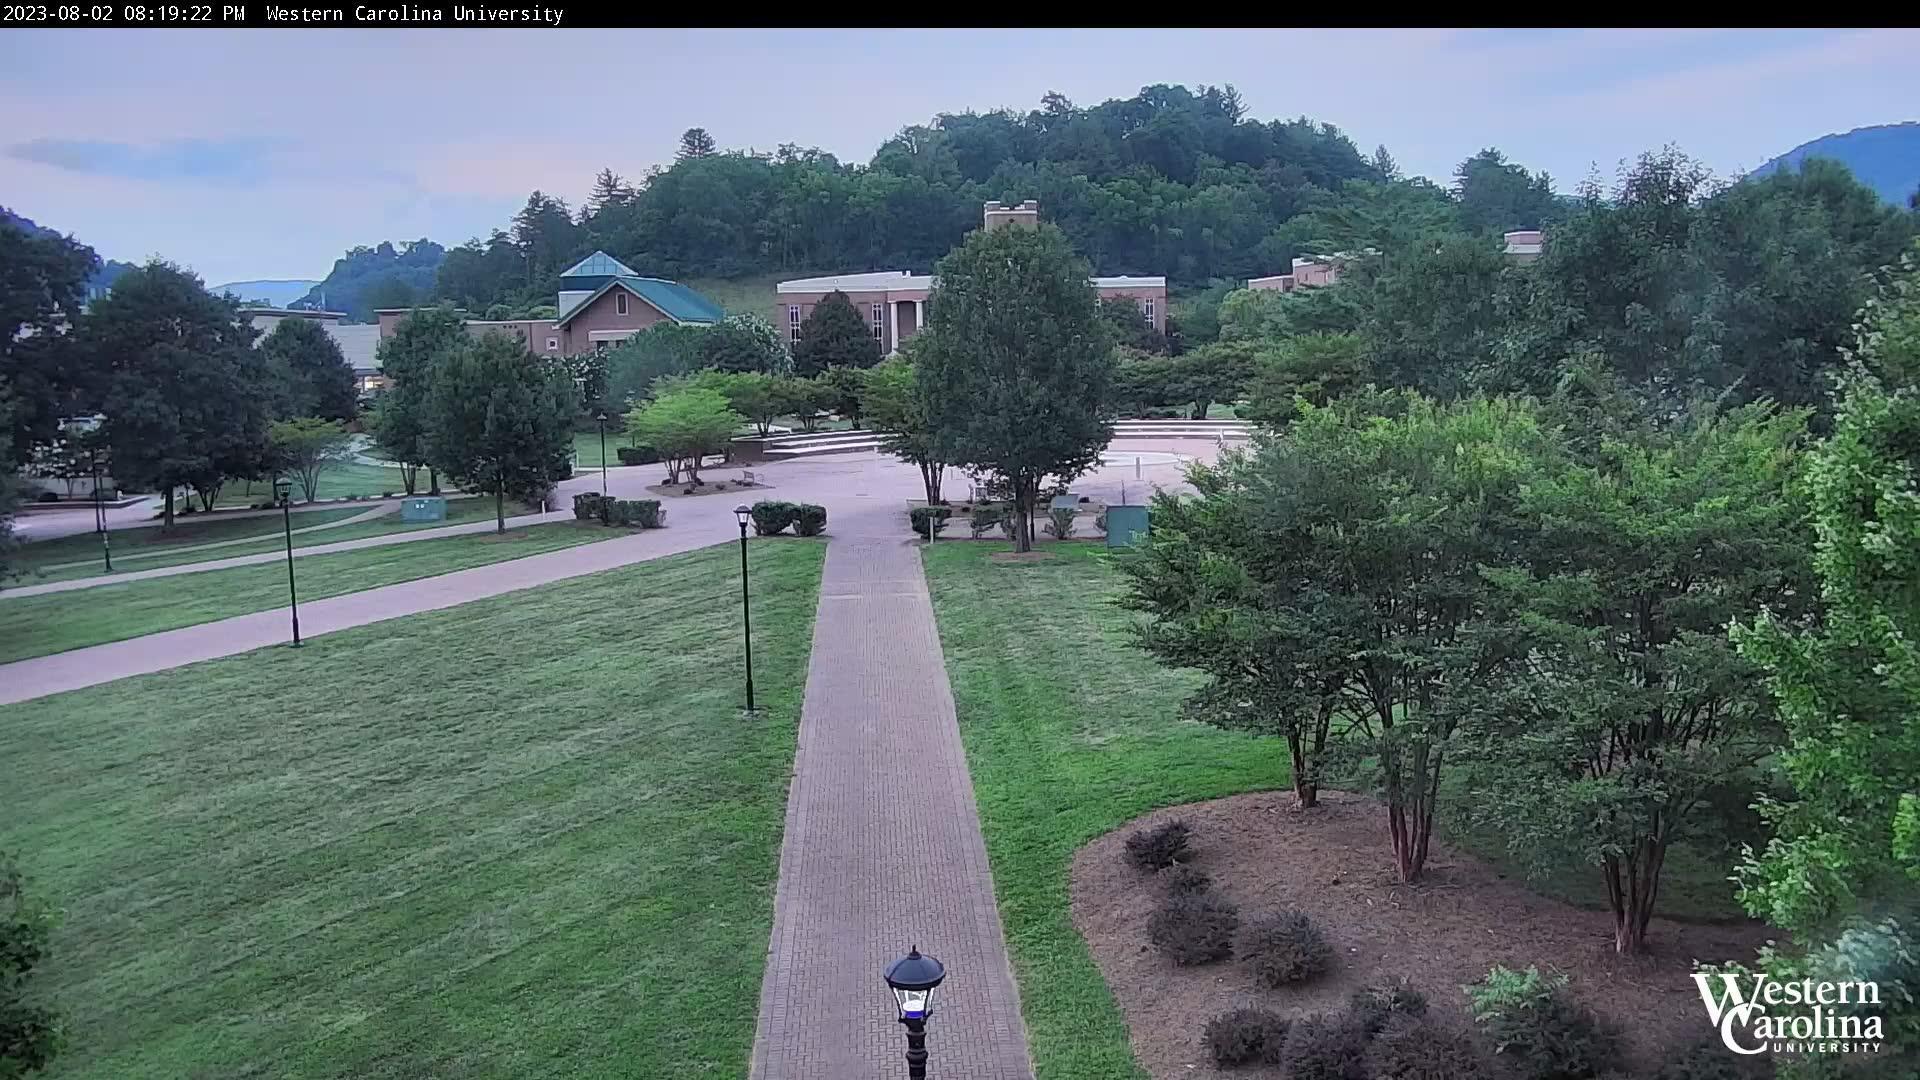 Webkamera Cullowhee: WCU UC Lawn